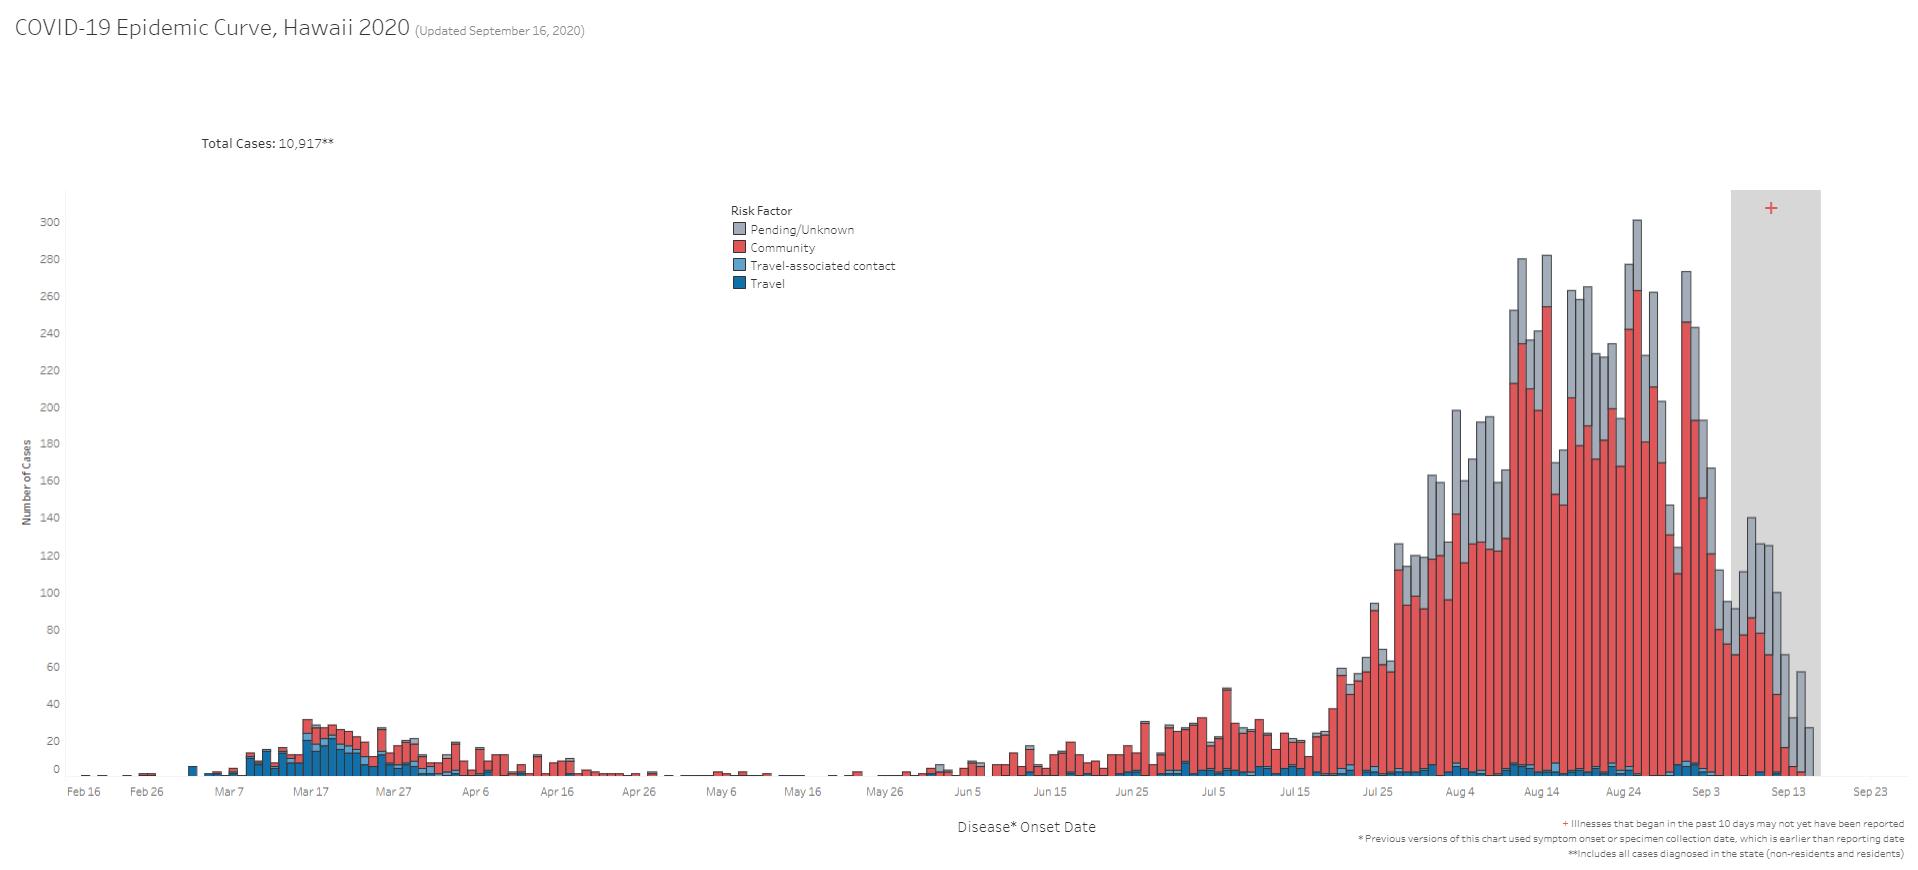 COVID-19 Epidemic Curve Hawaii September 16, 2020